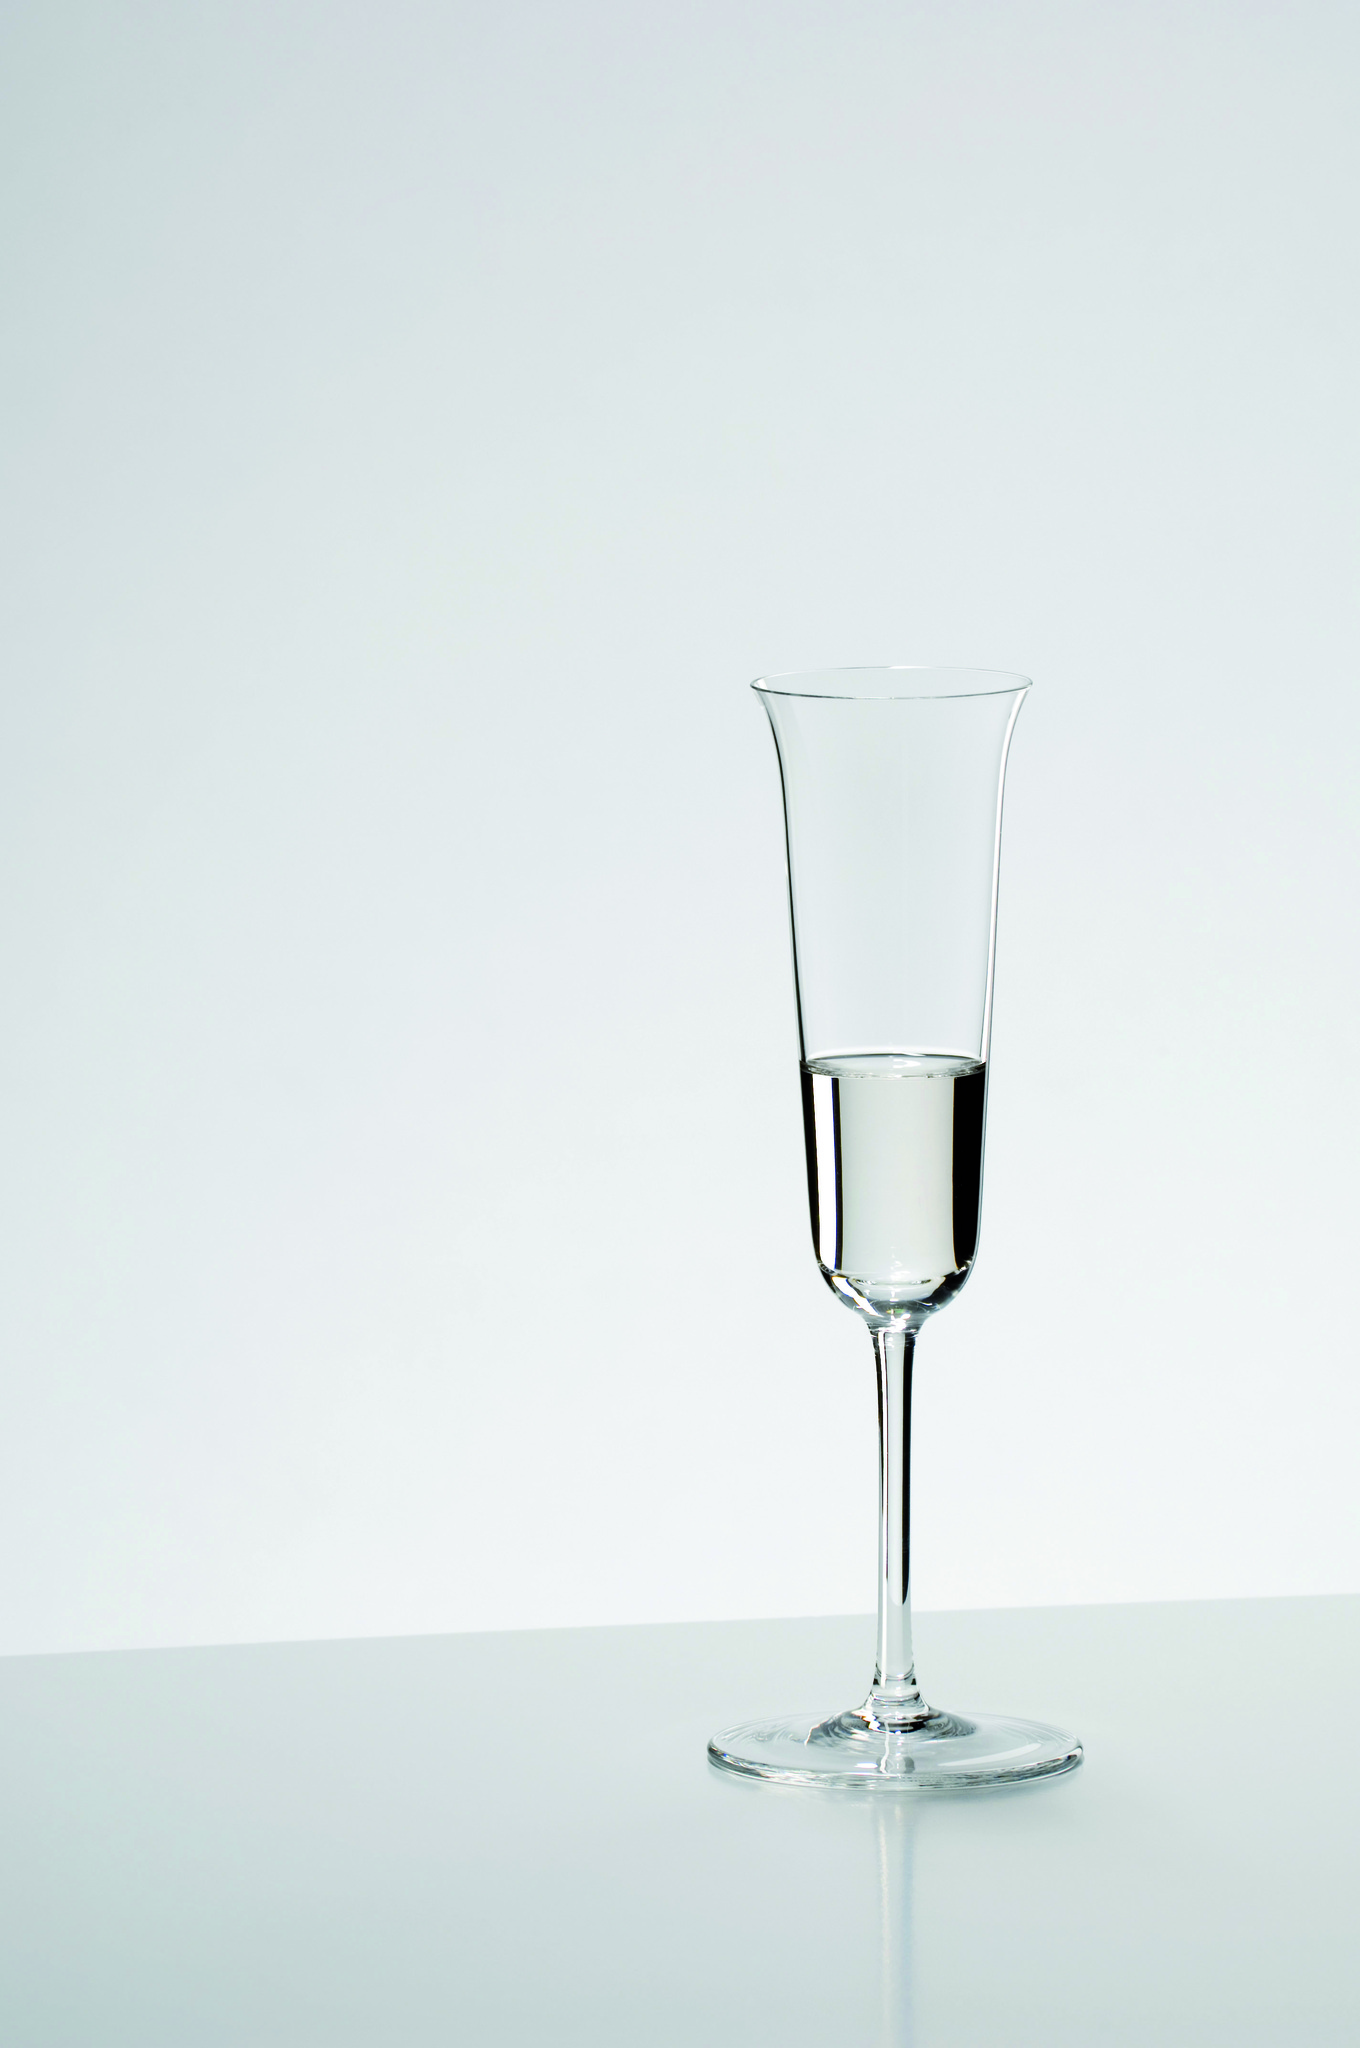 Бокал для граппы 110мл Riedel Sommeliers Destillate Grappa